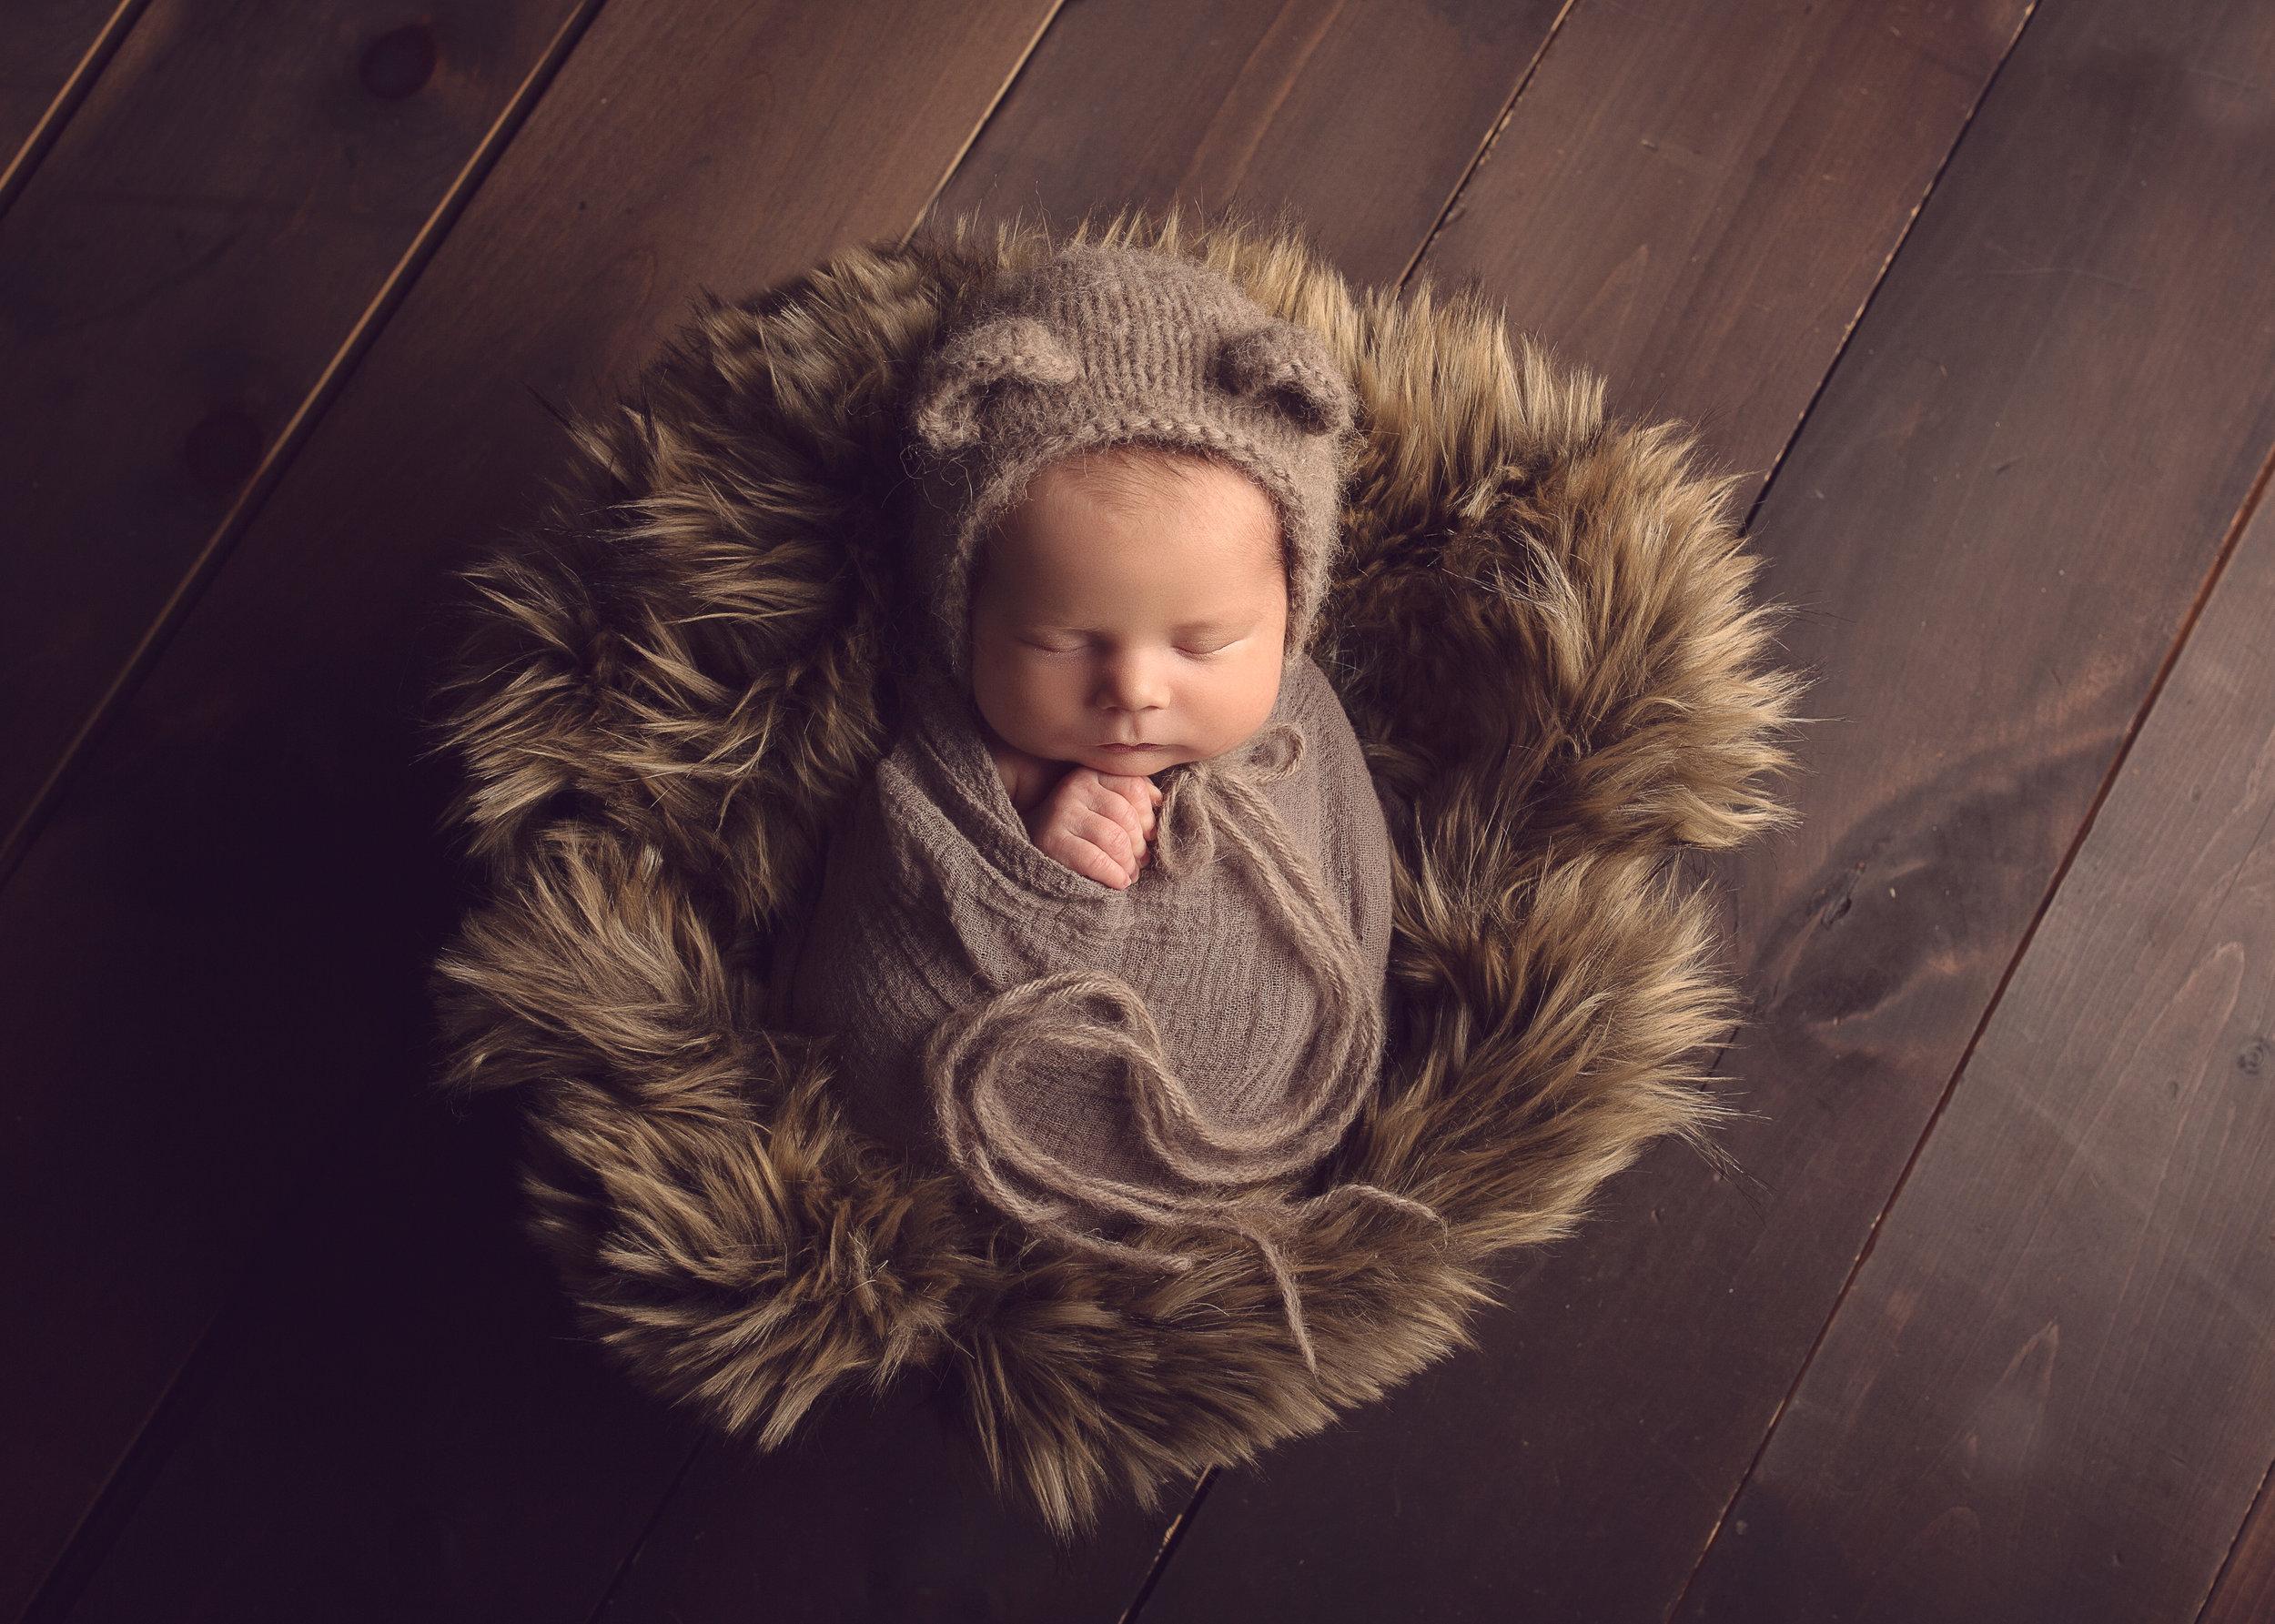 millbury_newborn_photographer_massachusetts_boston_baby_boy_photos4.jpg